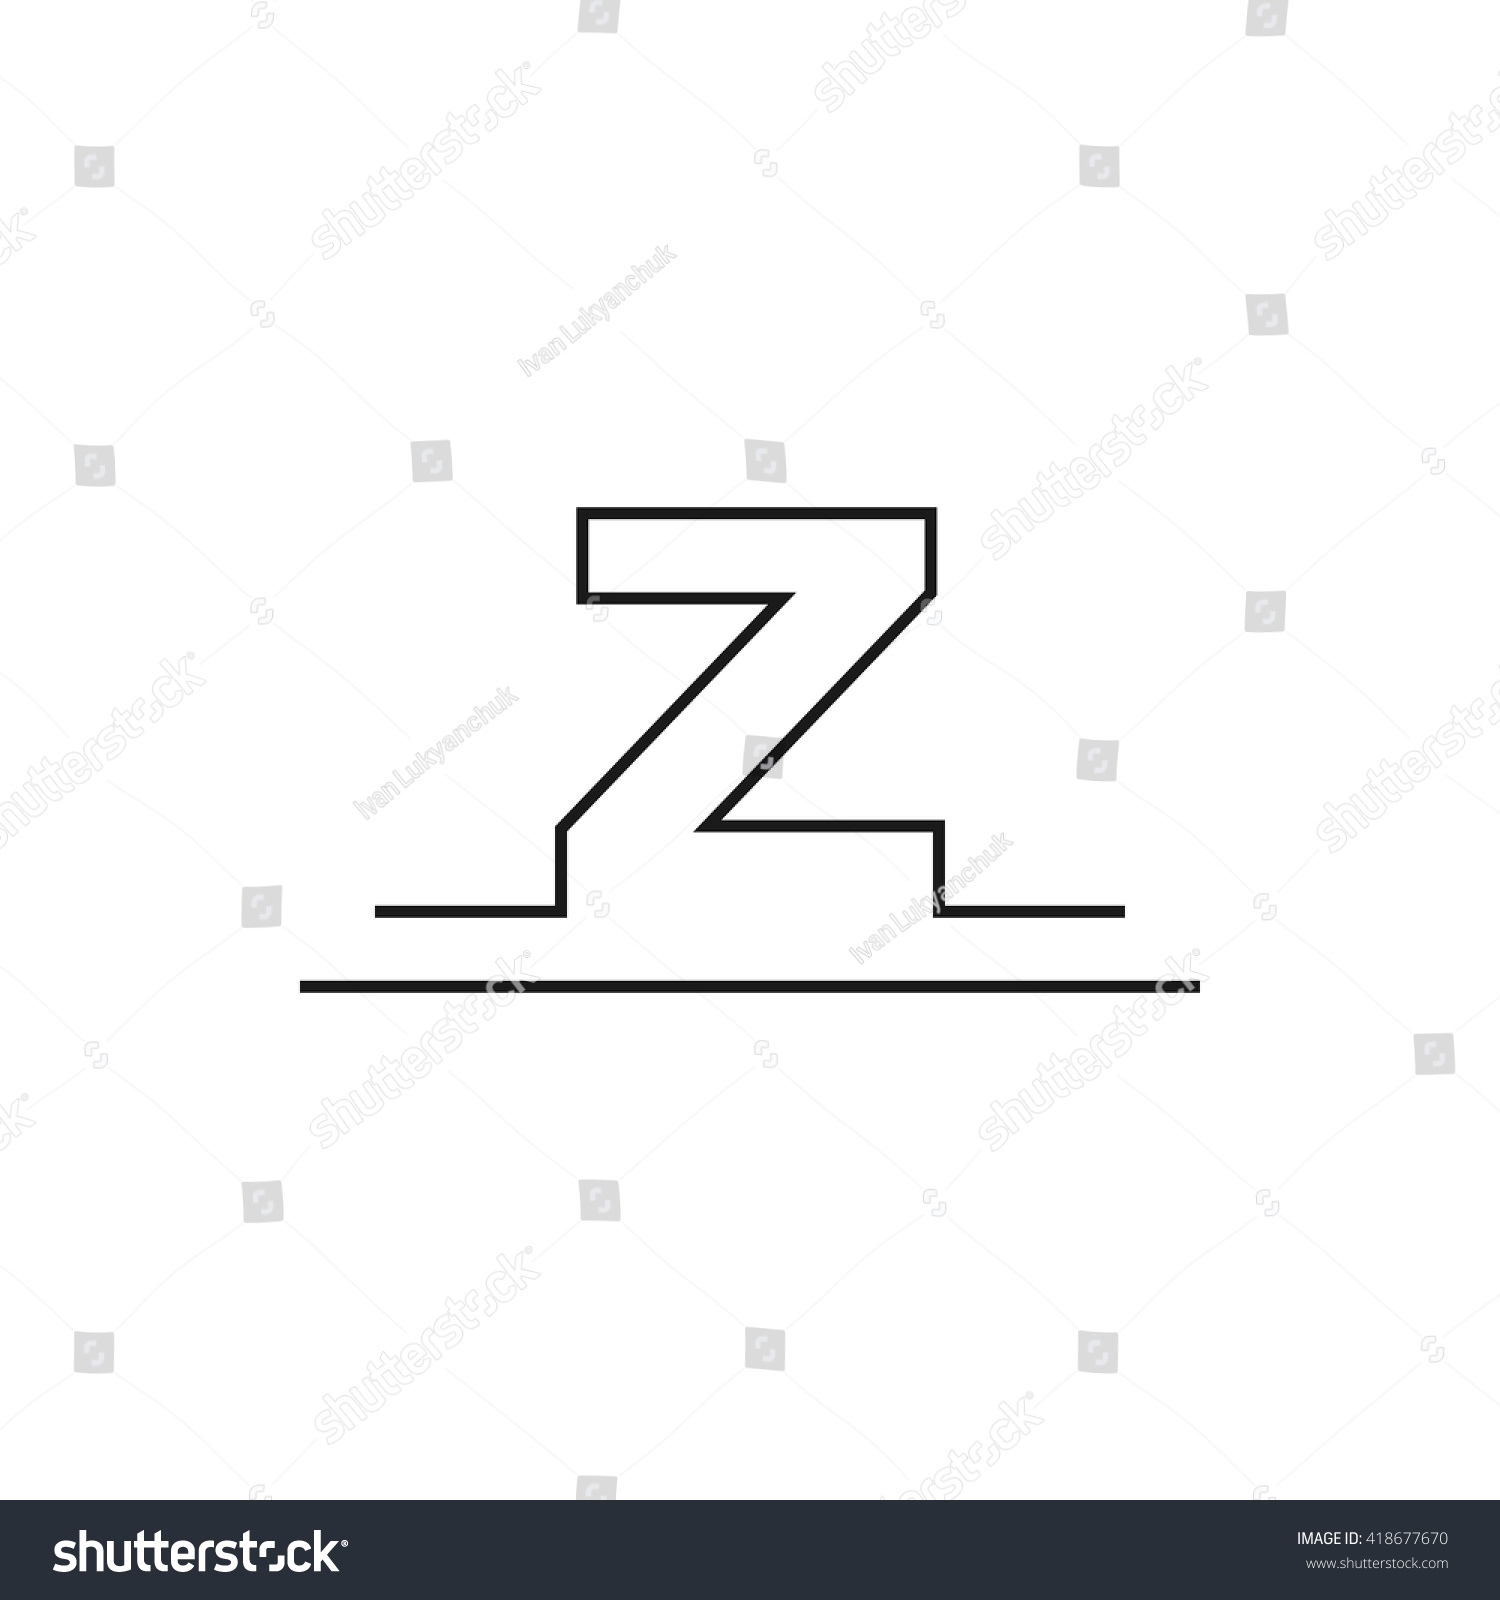 Outline letter z logo design your stock vector 2018 418677670 outline letter z for logo design your company vector illustrations spiritdancerdesigns Image collections